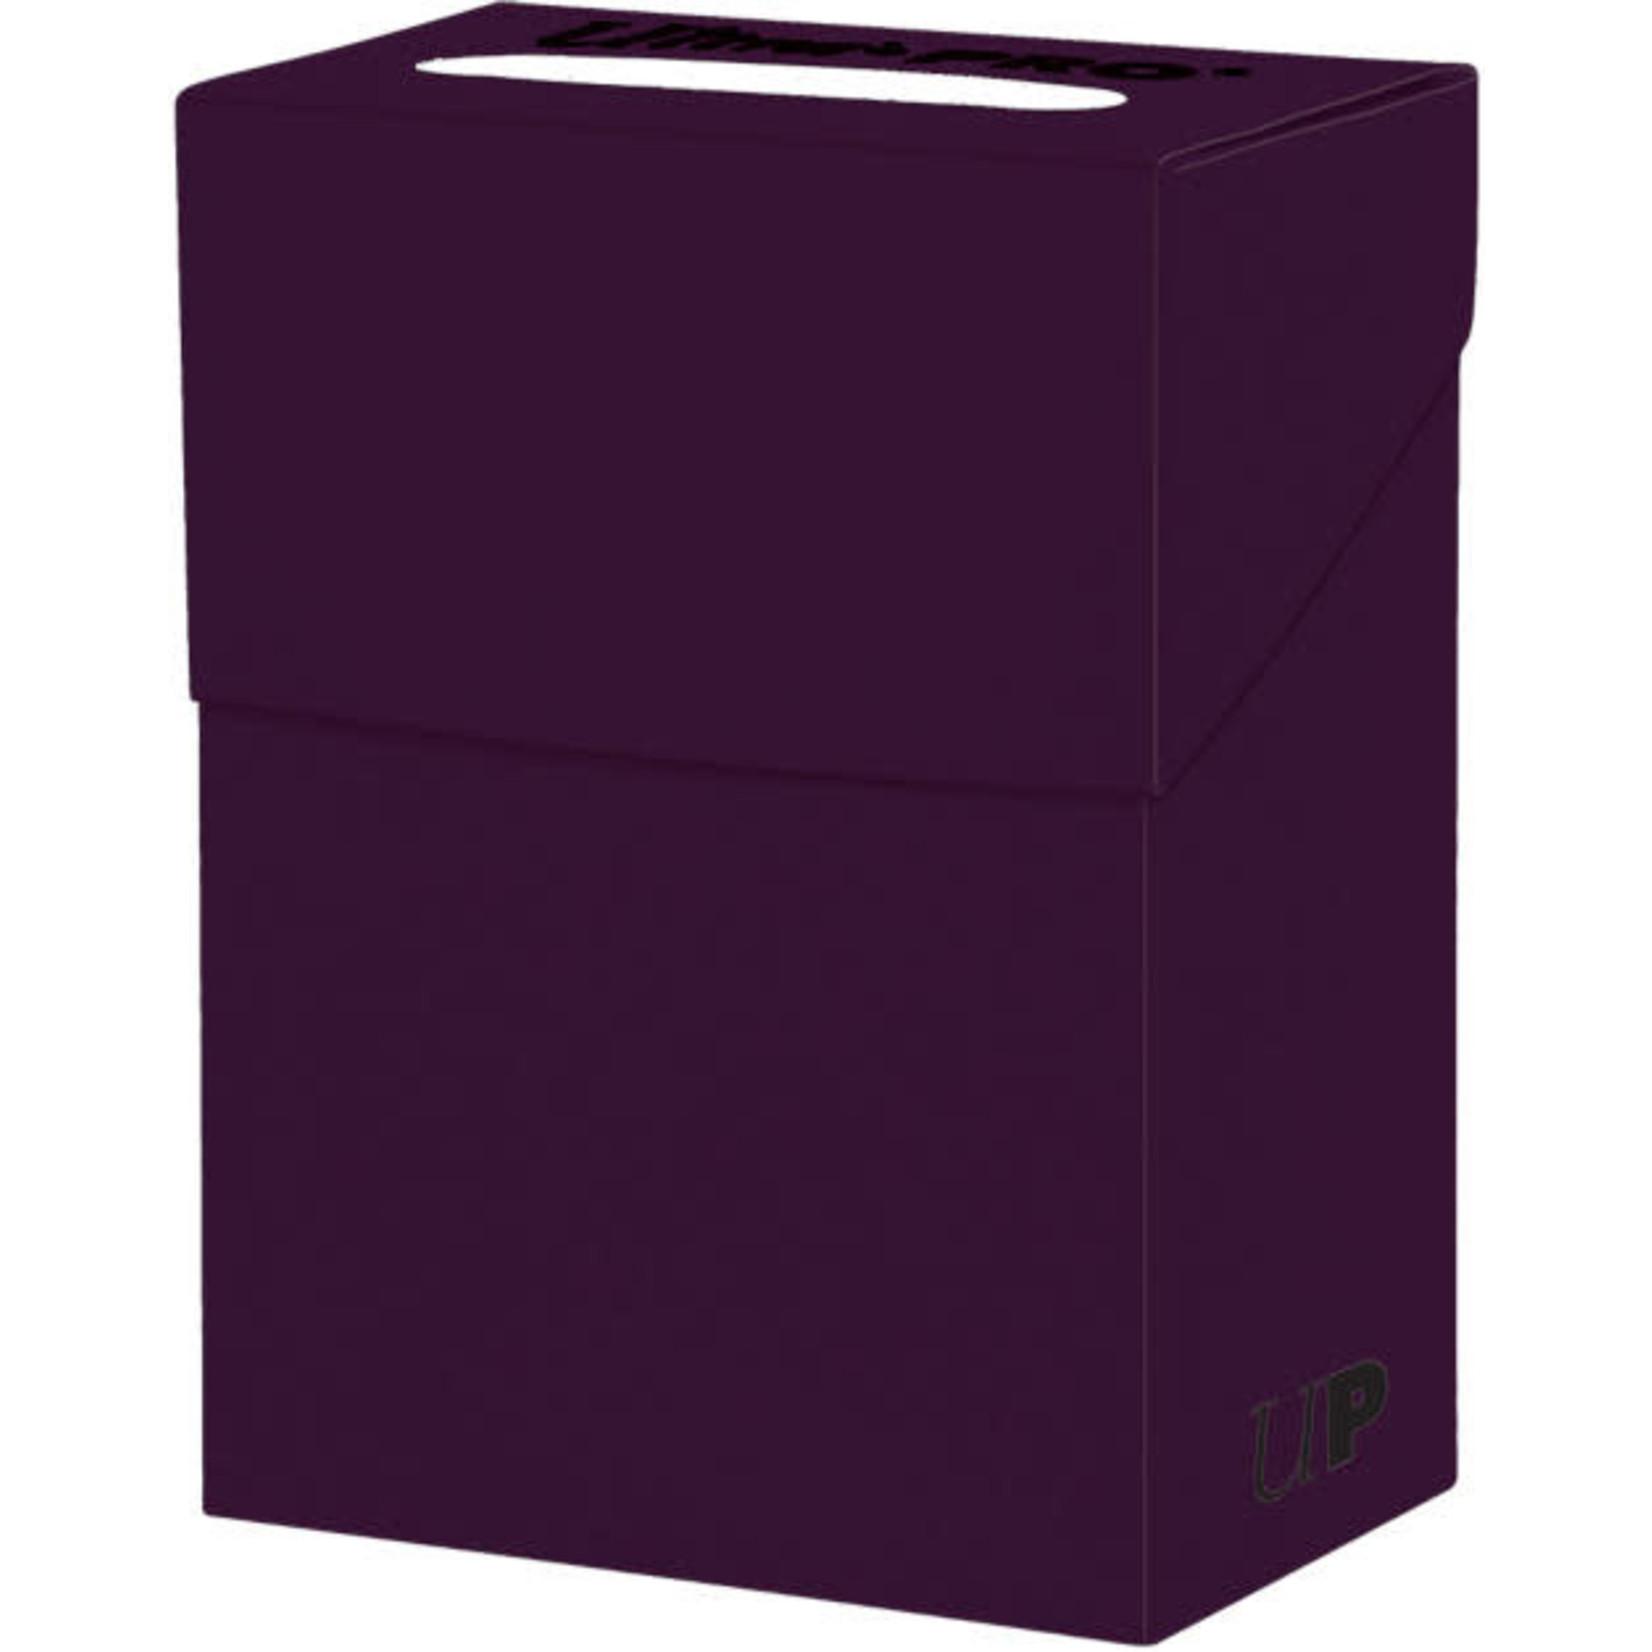 Solid Purple Deck Box